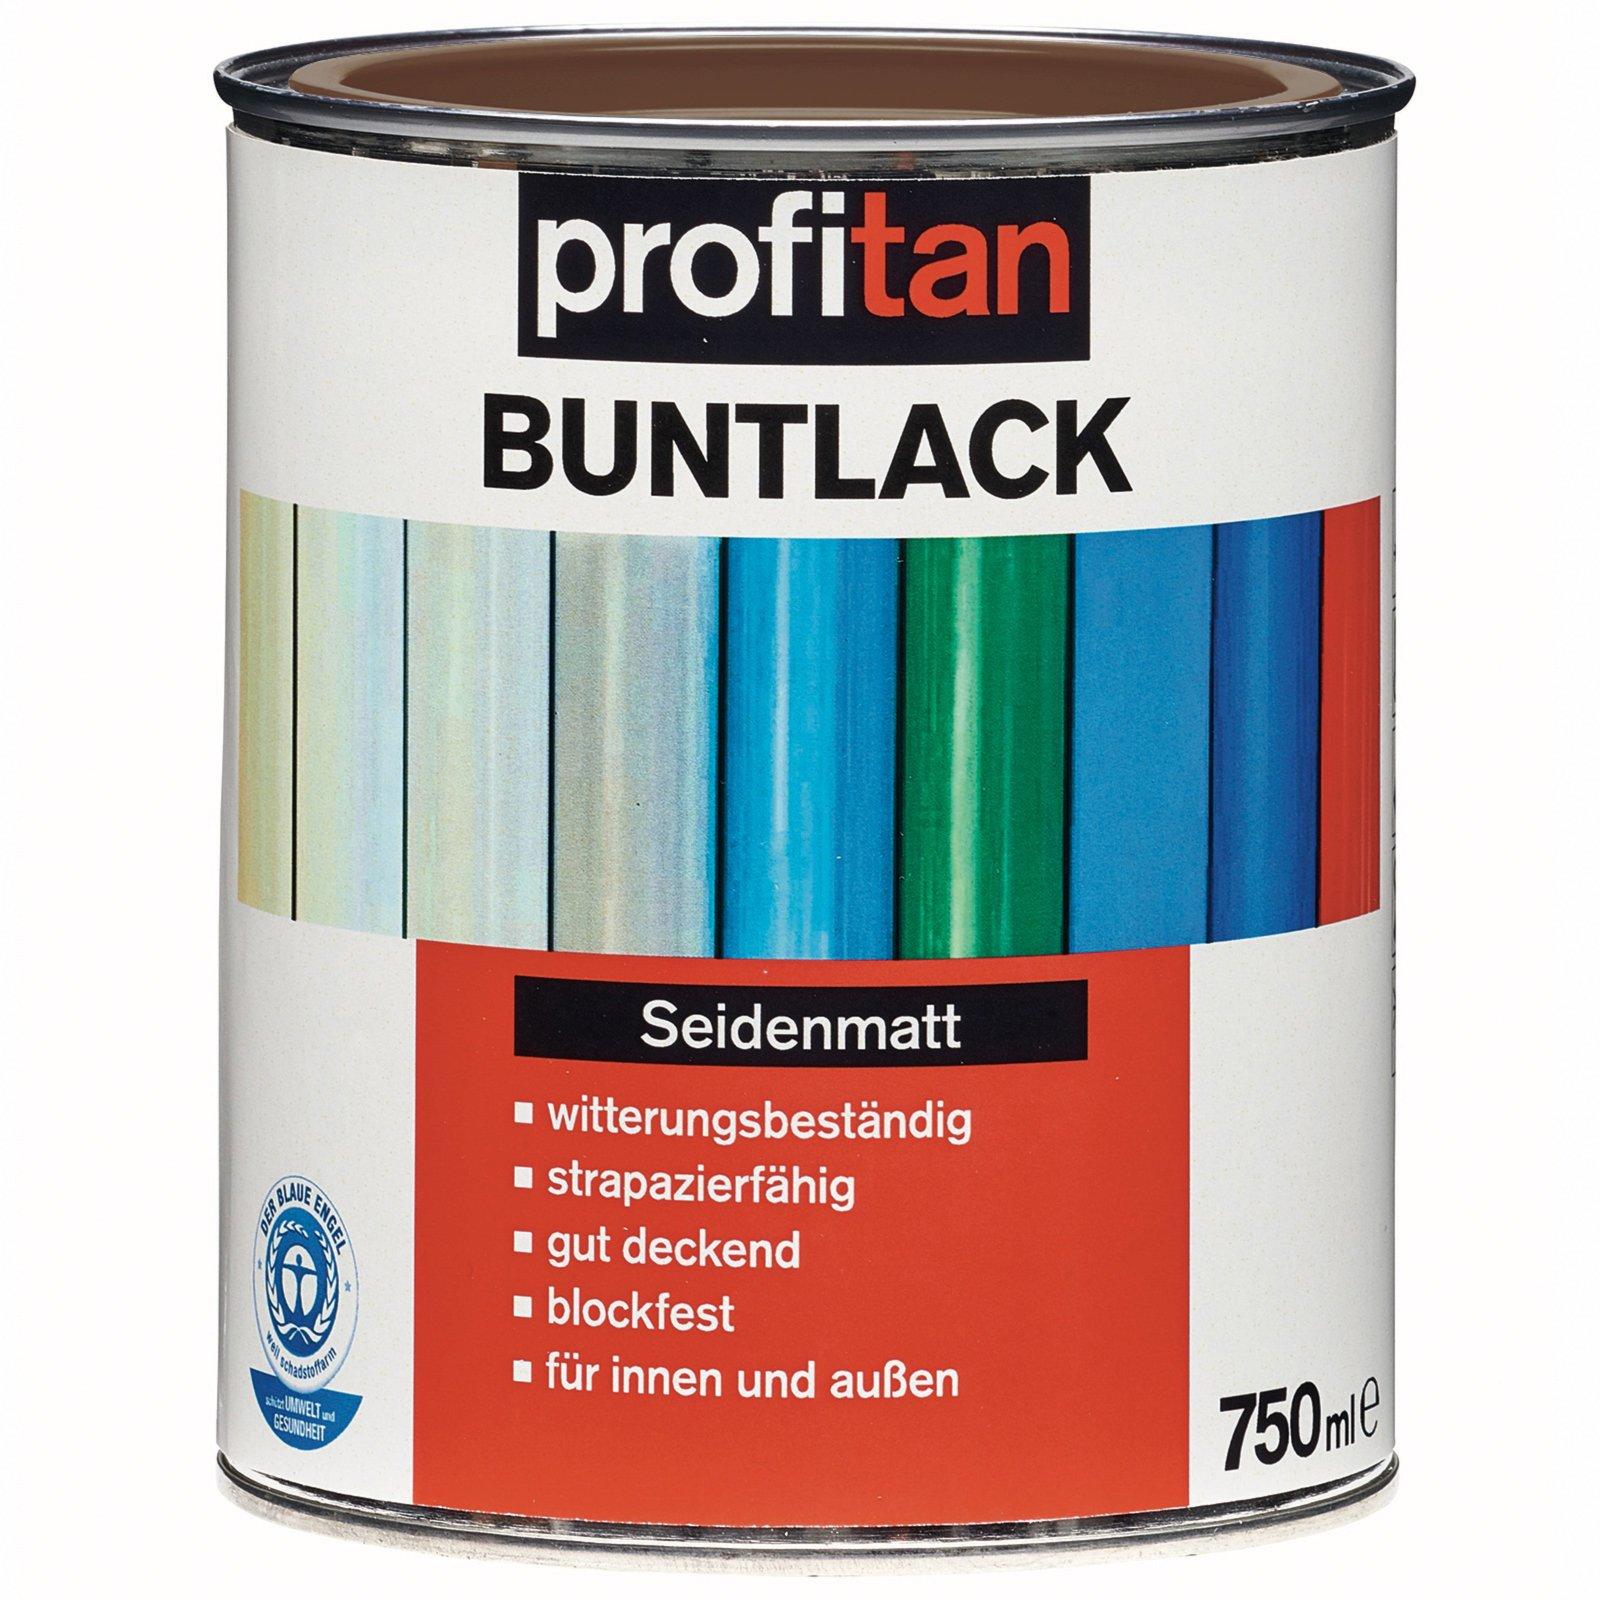 profitan Buntlack - nussbraun seidenmatt - 750 ml